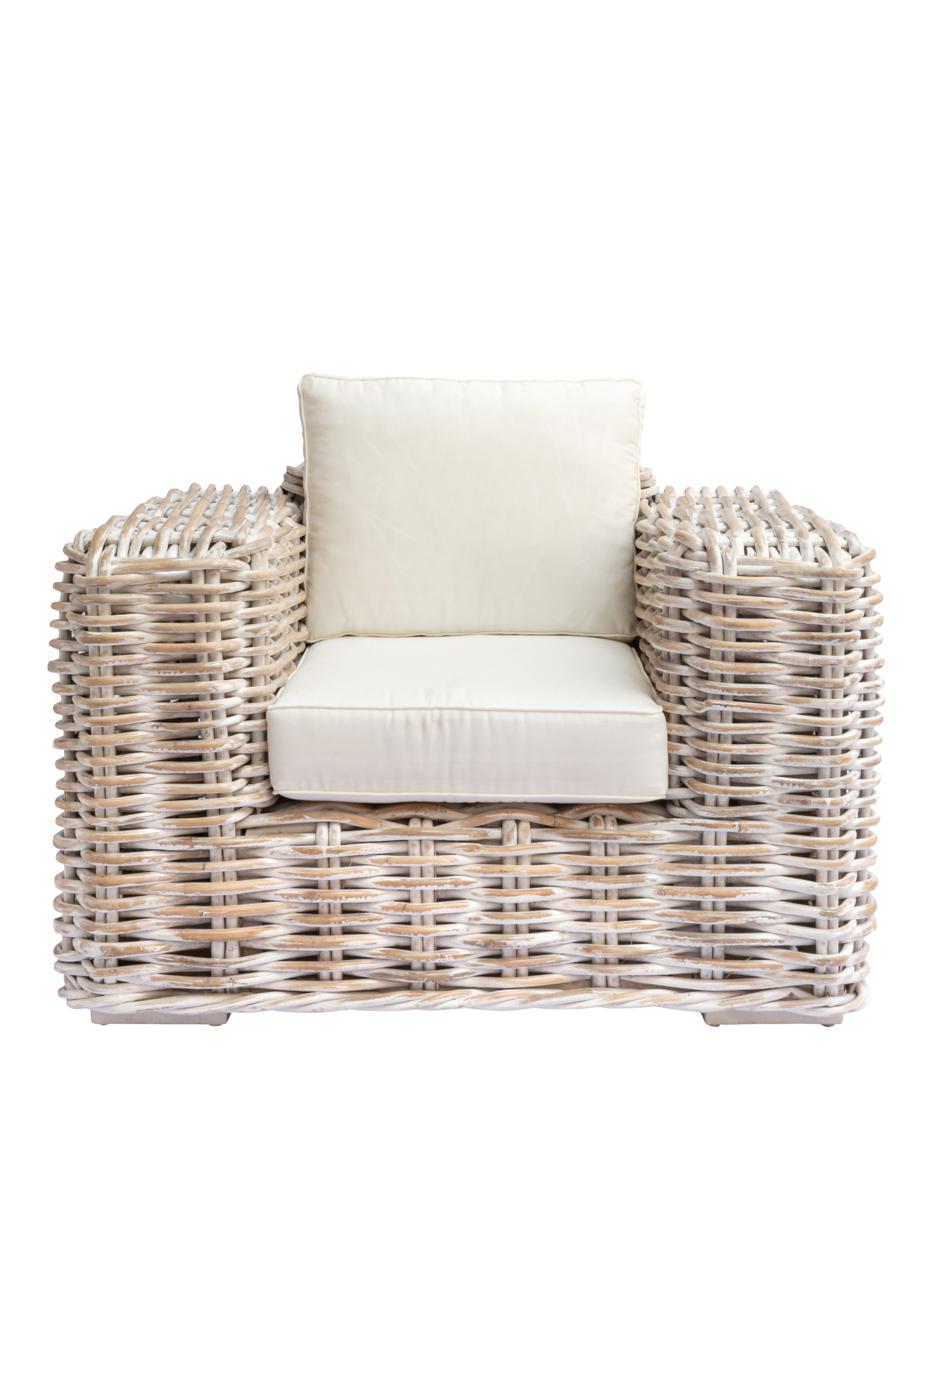 Cherbon rattan sofa - 1 Seat